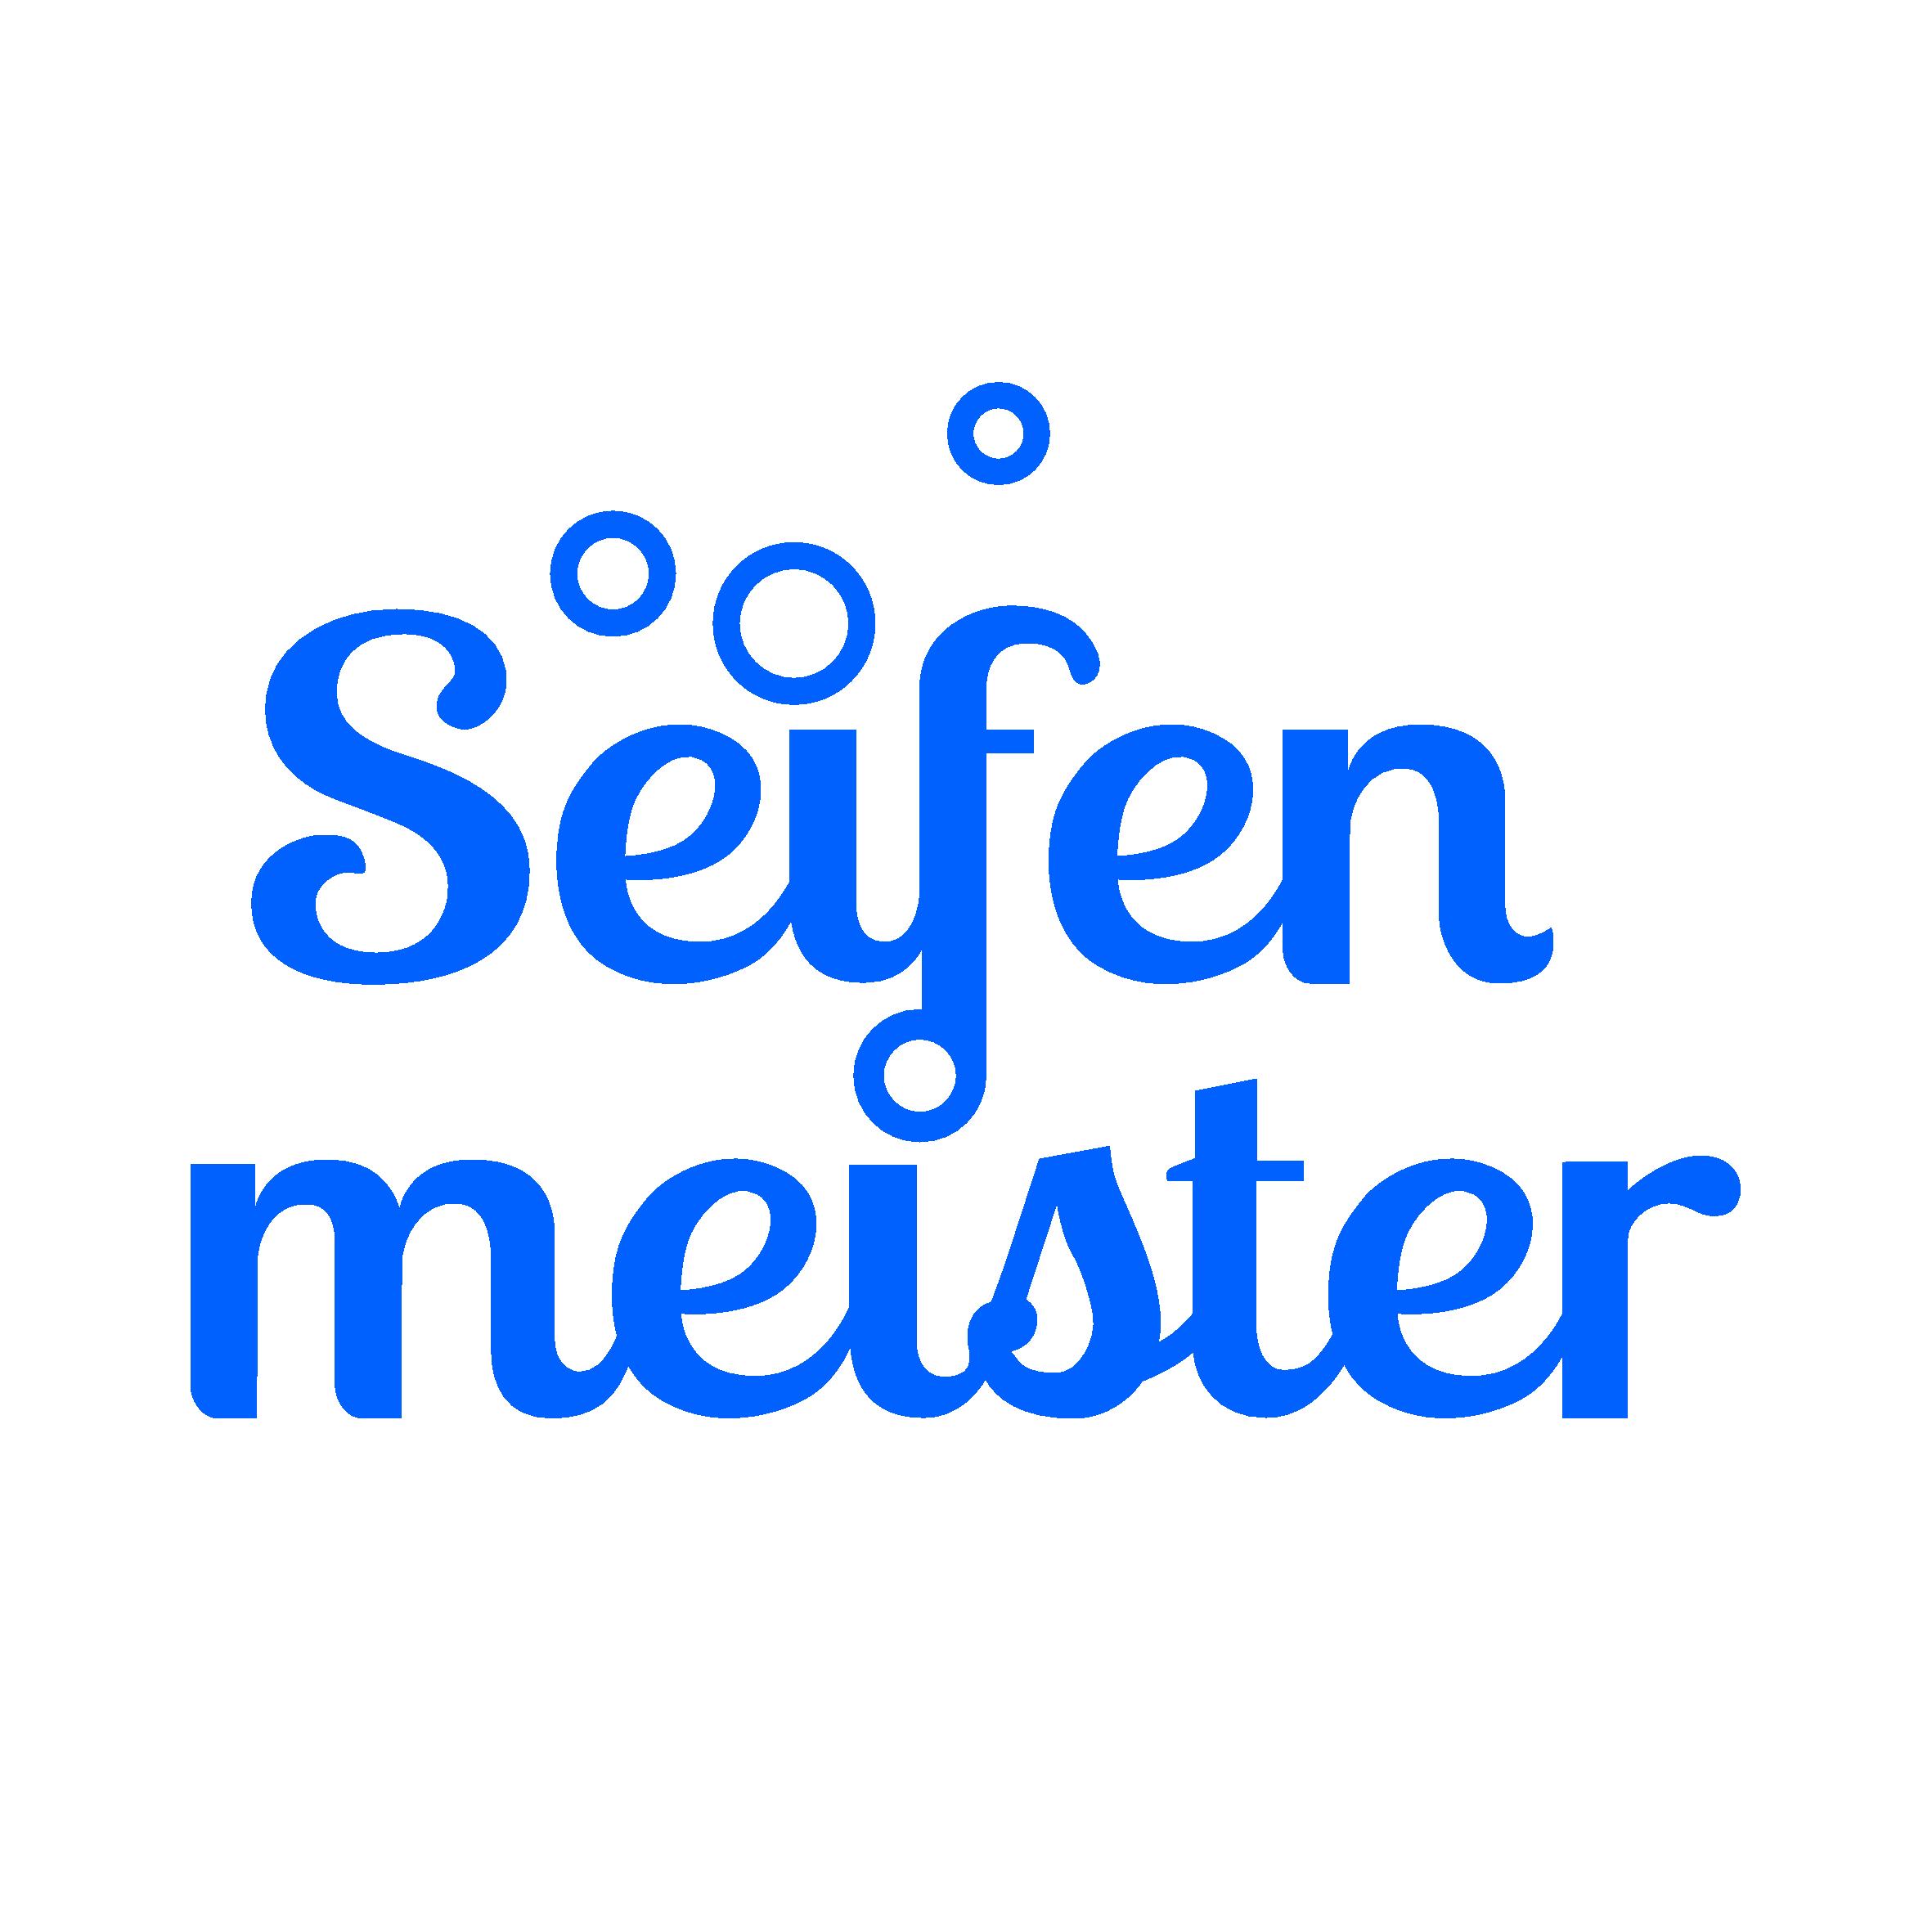 Seifenmeister